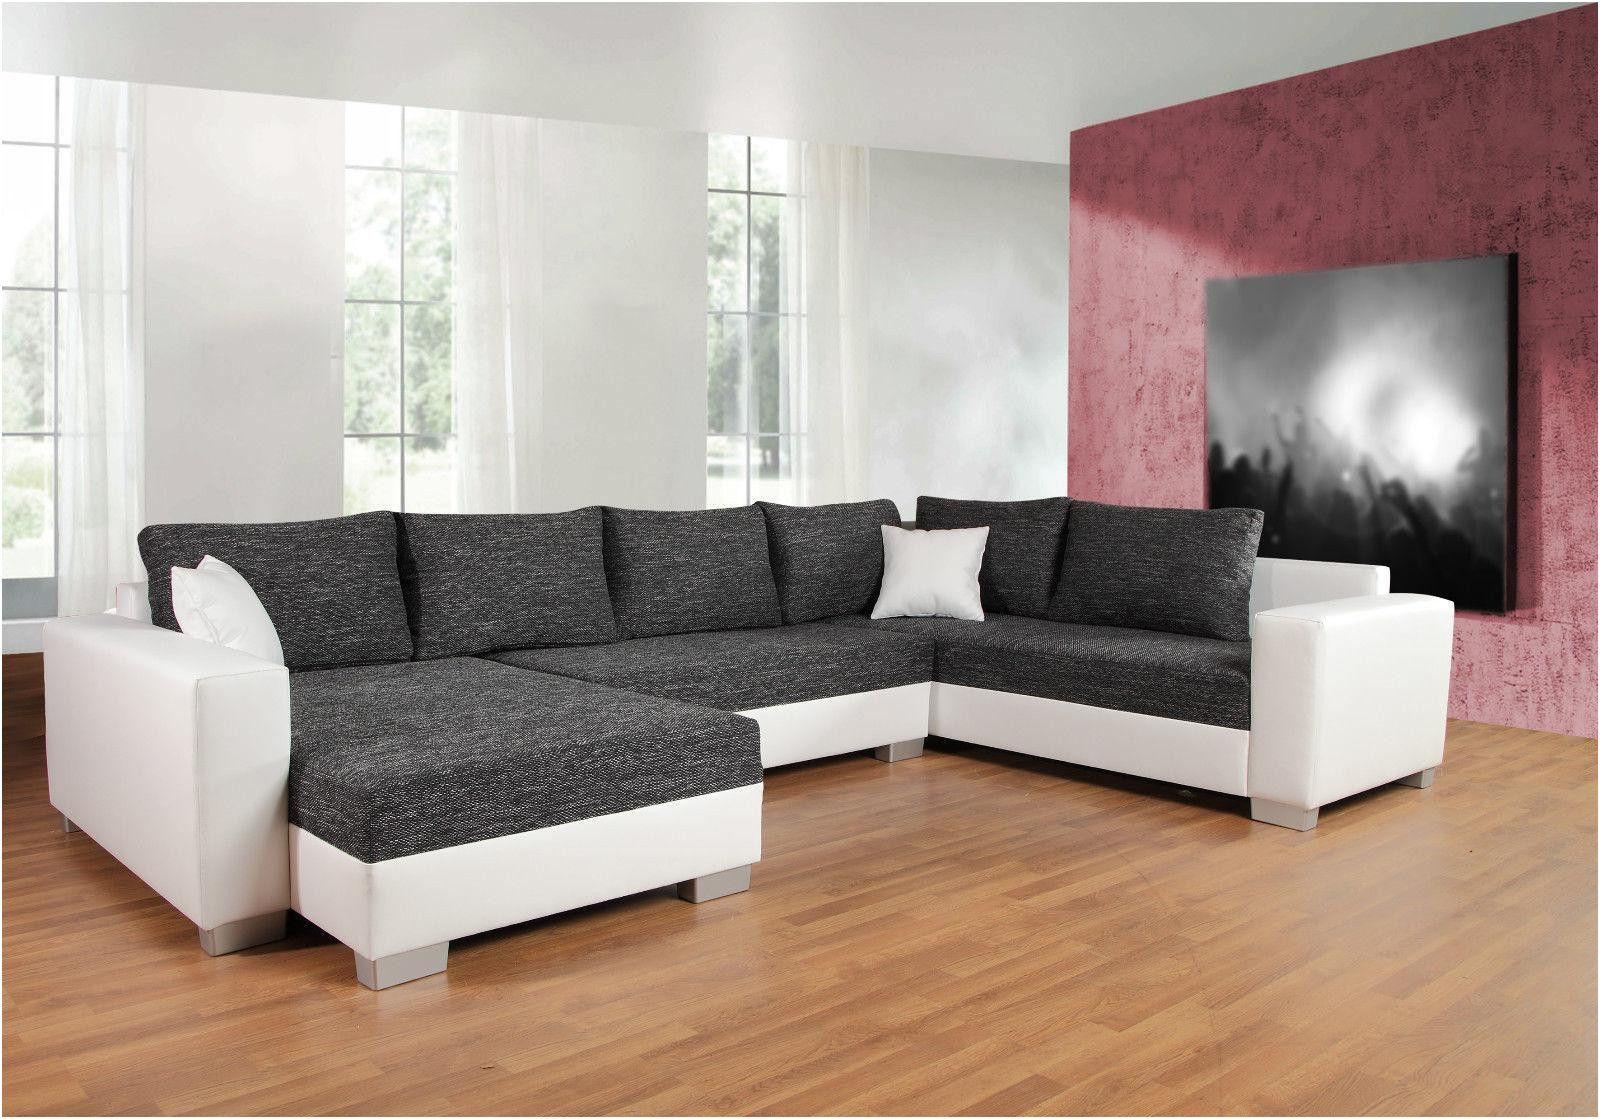 Beautiful Stunning Sofa U Form Gnstig With Sofa U Form Gnstig With Uform With U Form With L Couch Gnstig Di 2020